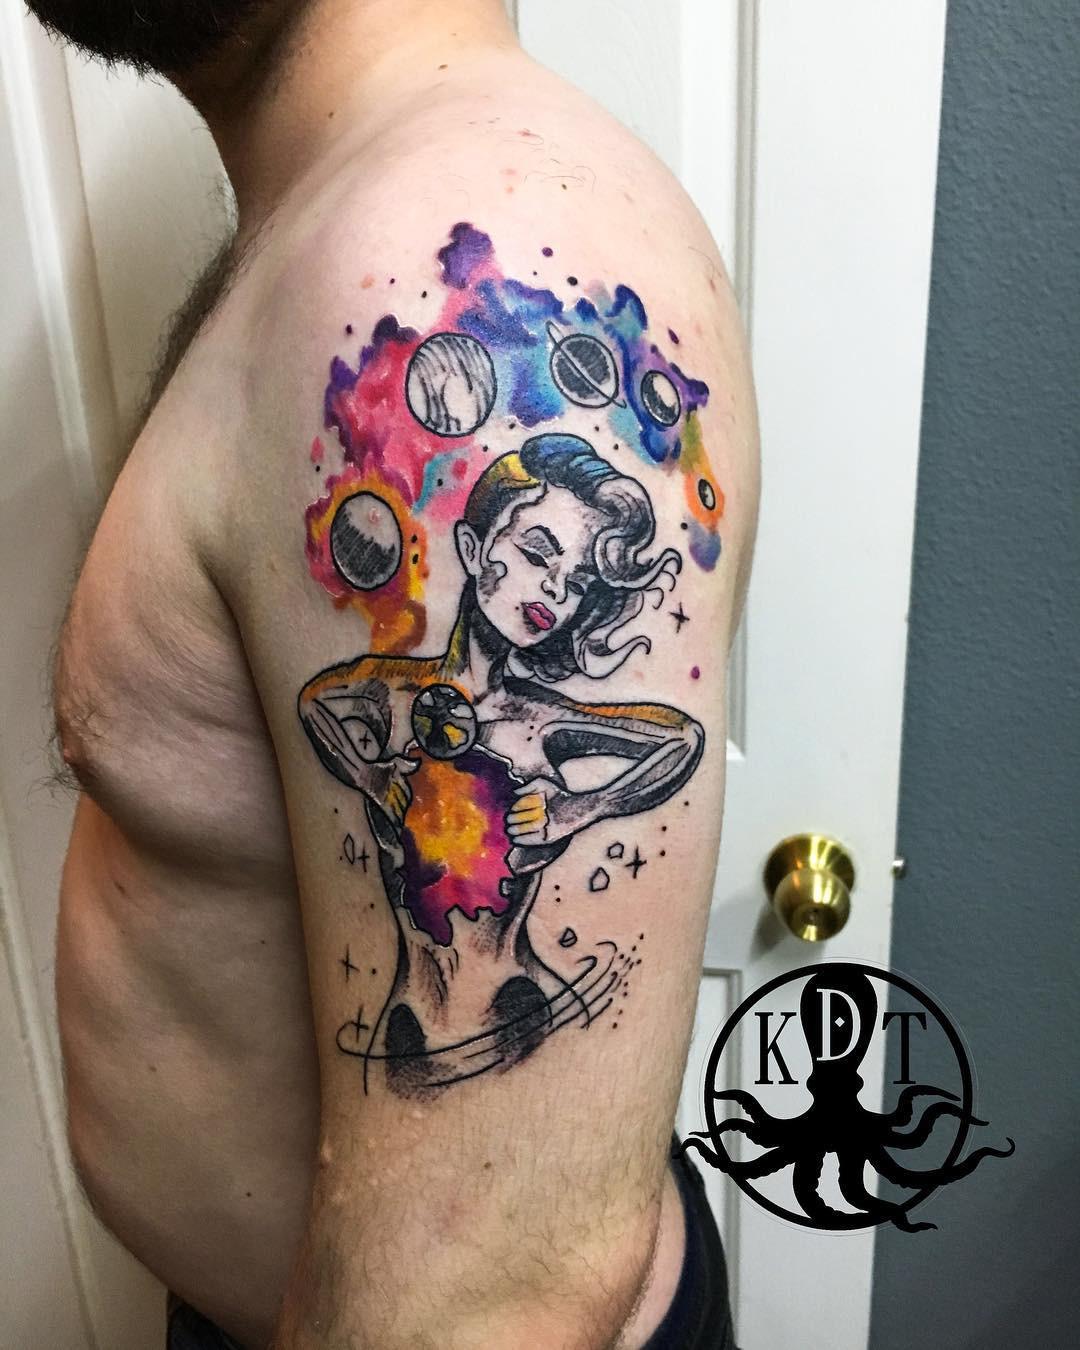 Inksearch tattoo Denis Kononenko